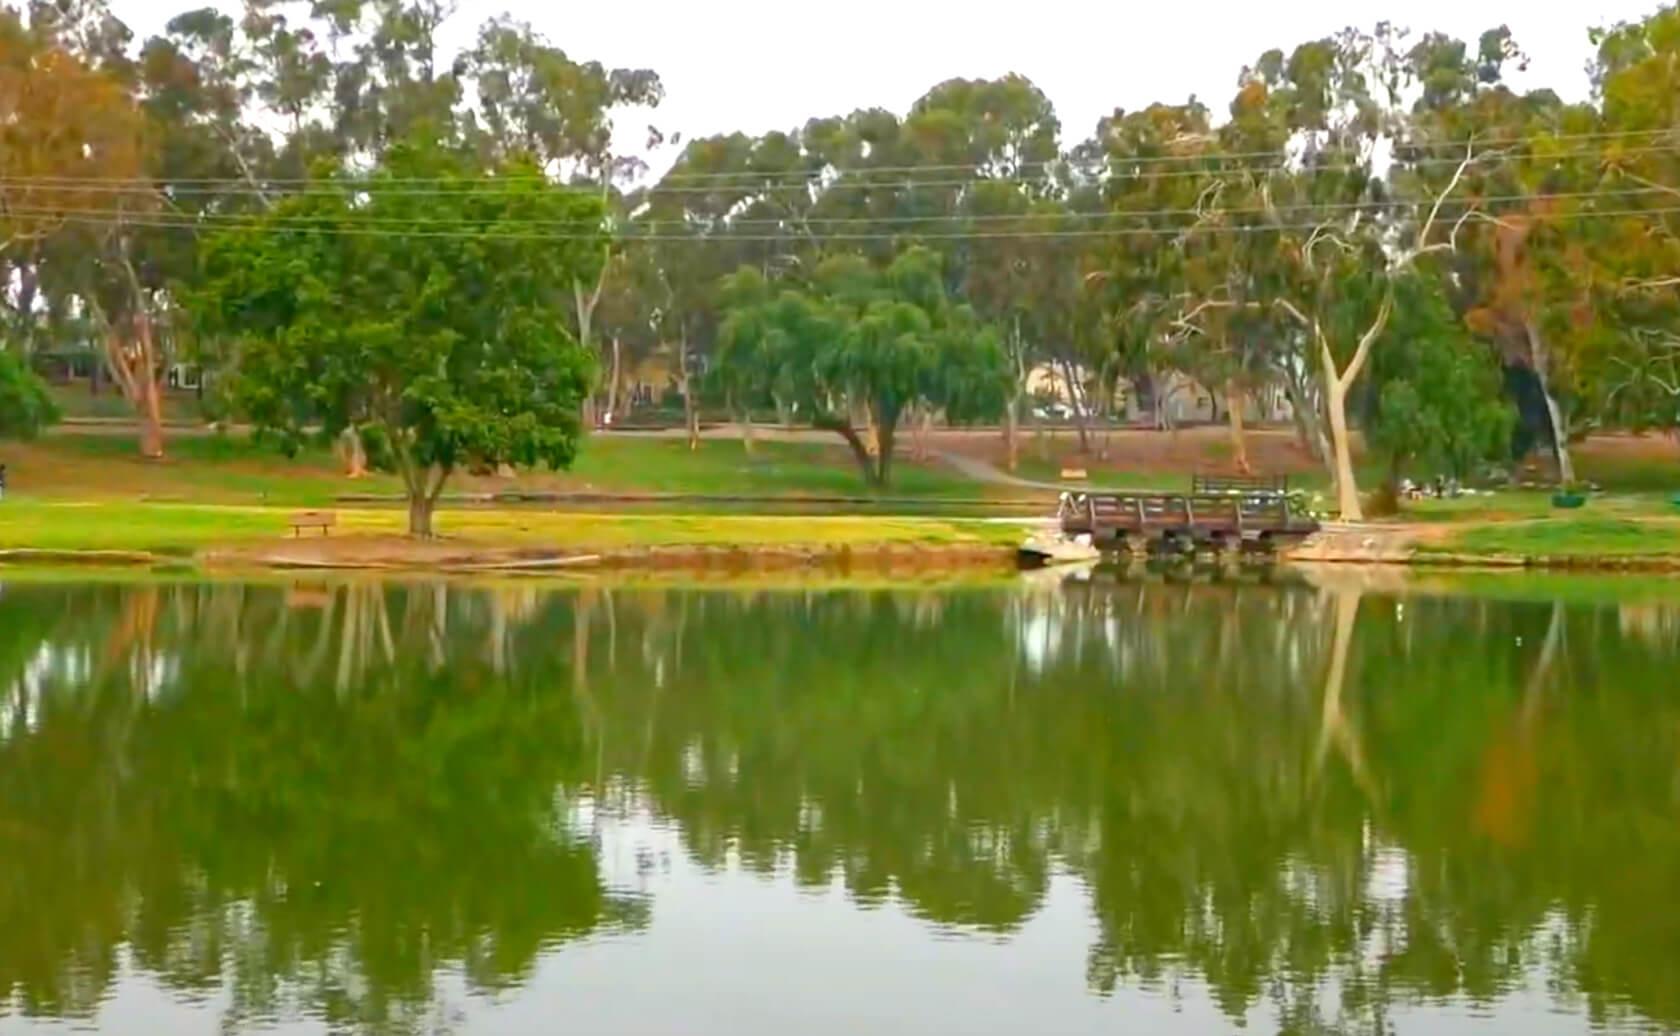 Tri-City-Park-Lake-Fishing-Guide-Report-Placentia-CA-07